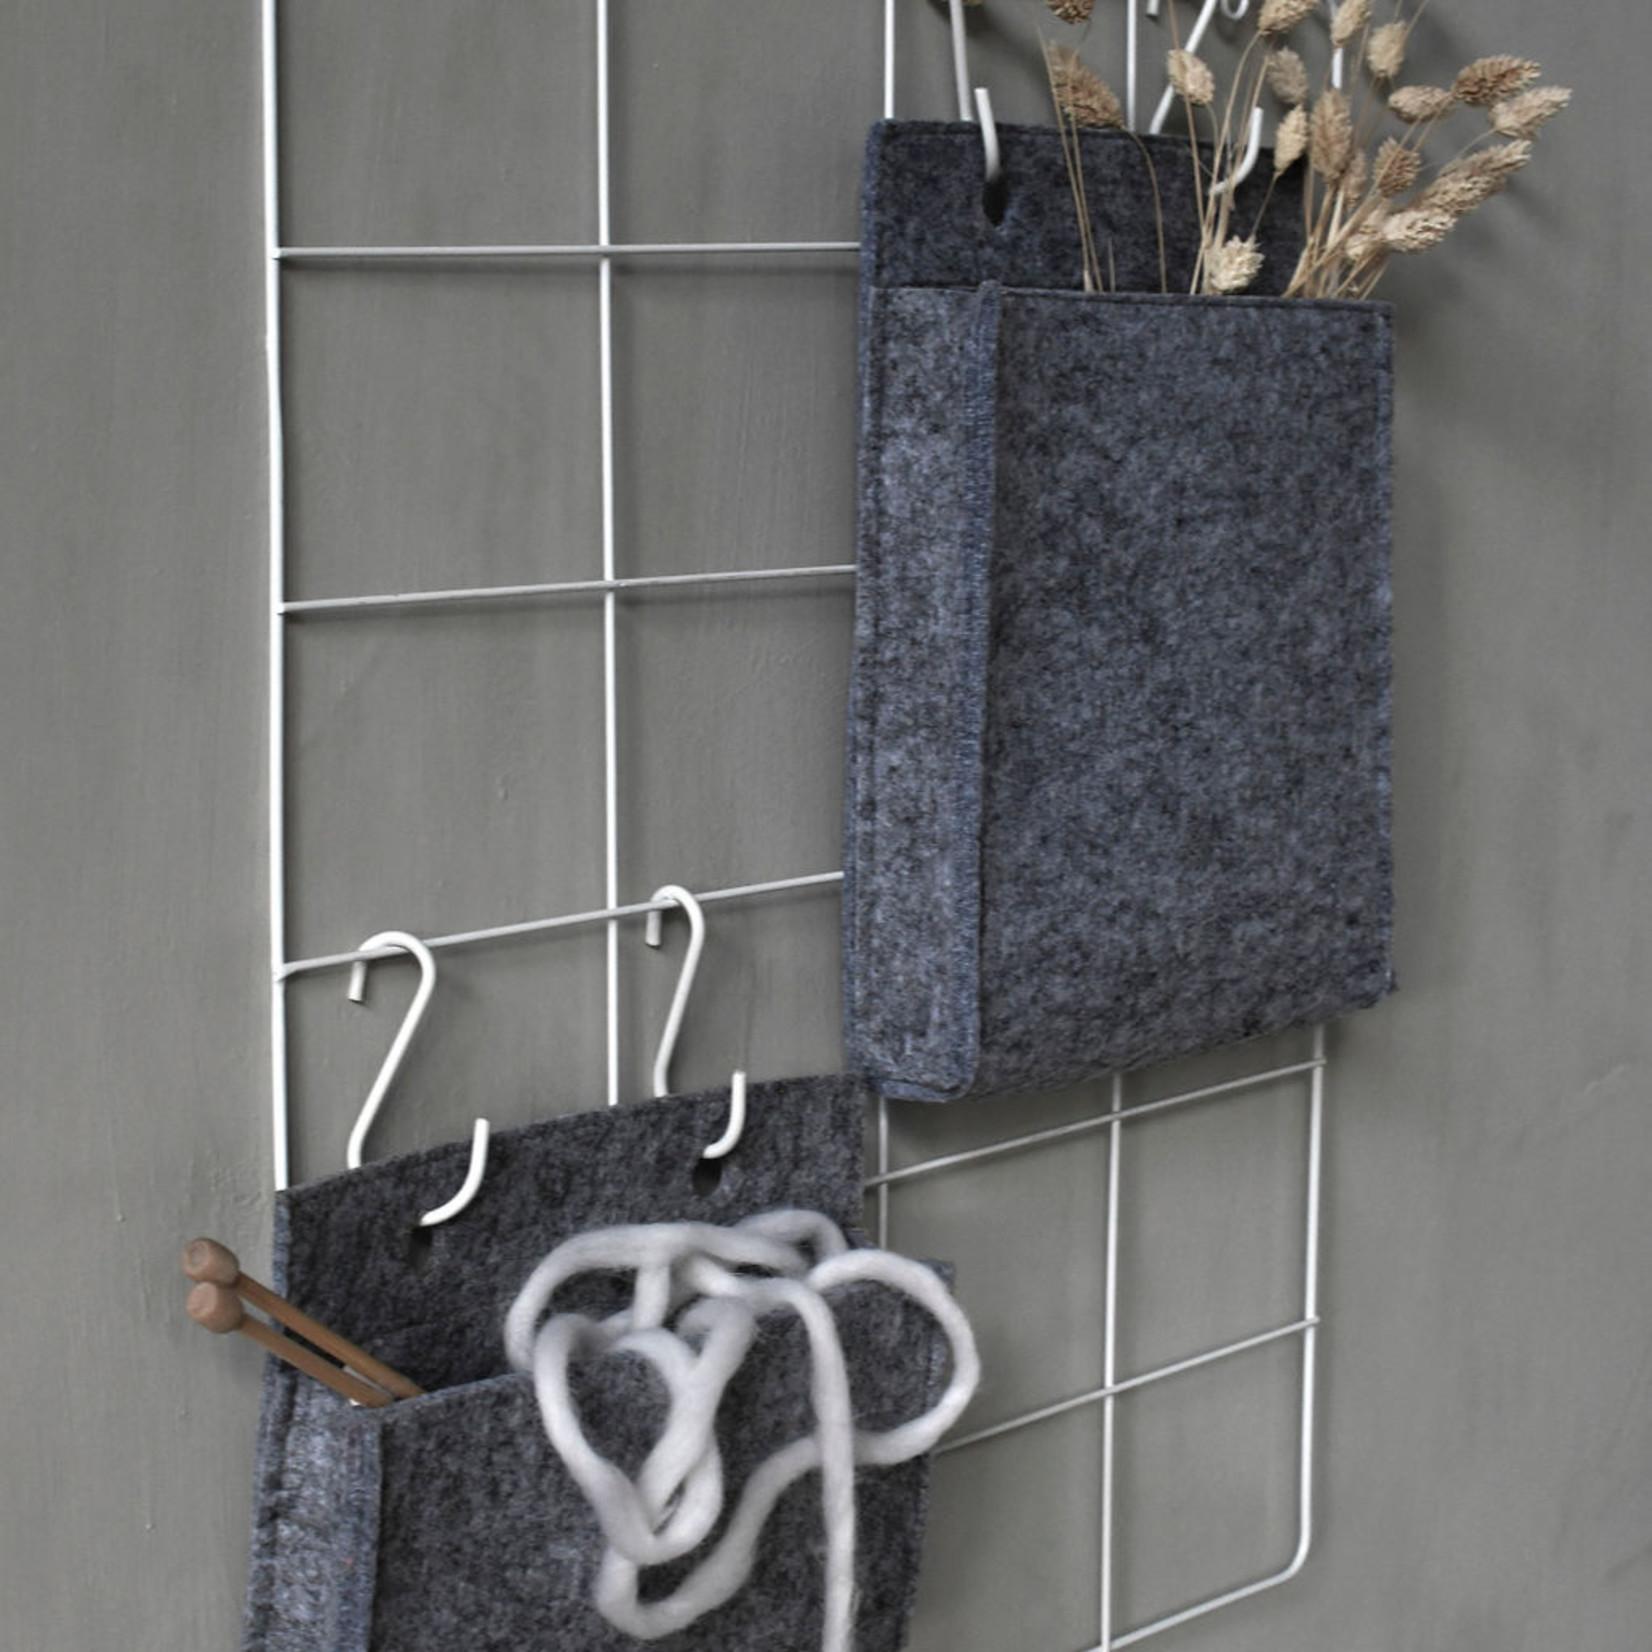 Storefactory  Haken weiß 4er Set